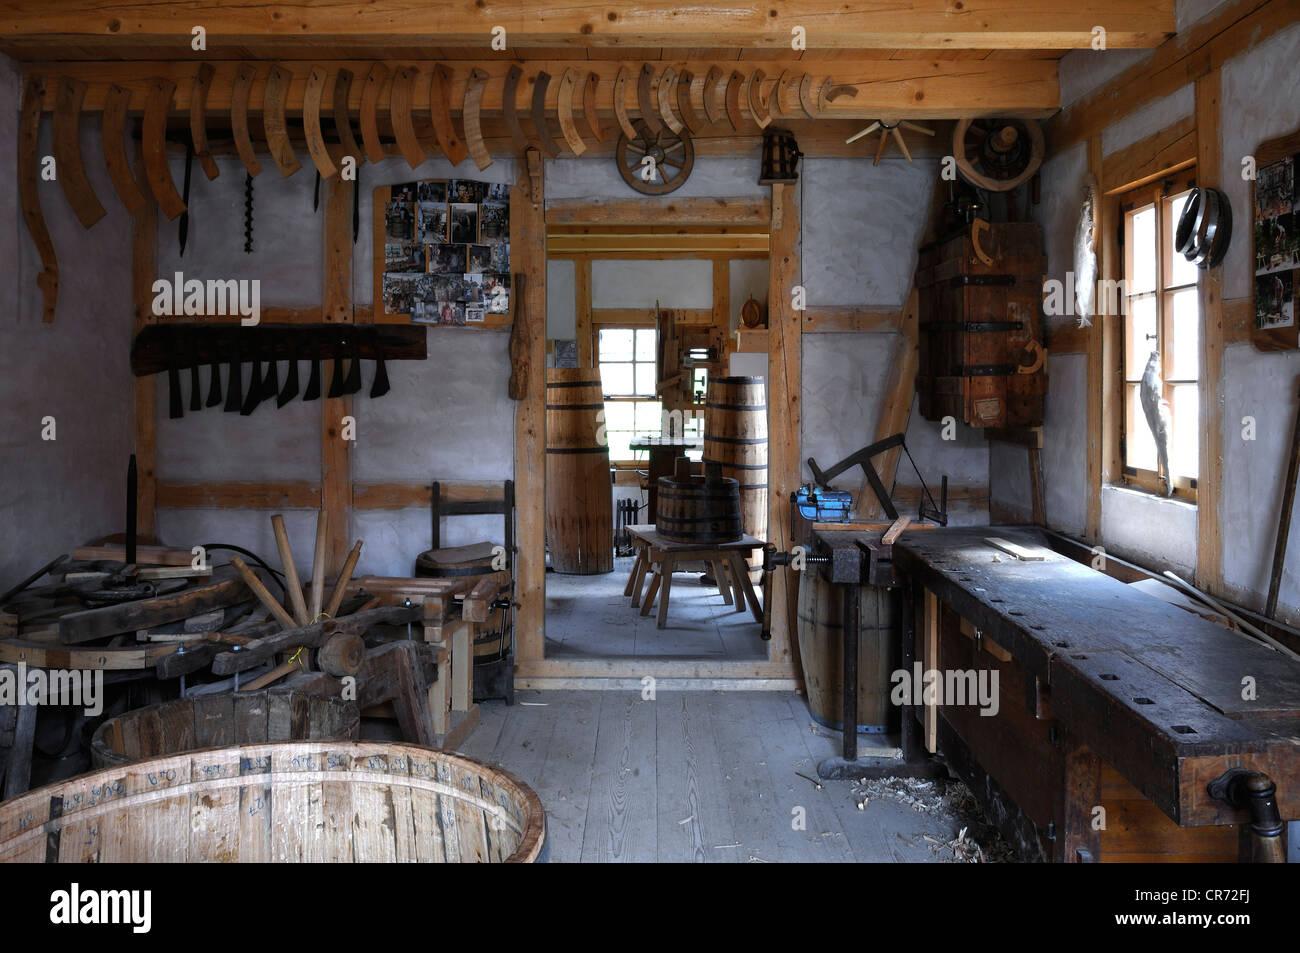 Cooper and wheelwright's workshop from Egersheim, 1887, Franconian open-air museum, Eisweiherweg 1, Bad Windsheim - Stock Image